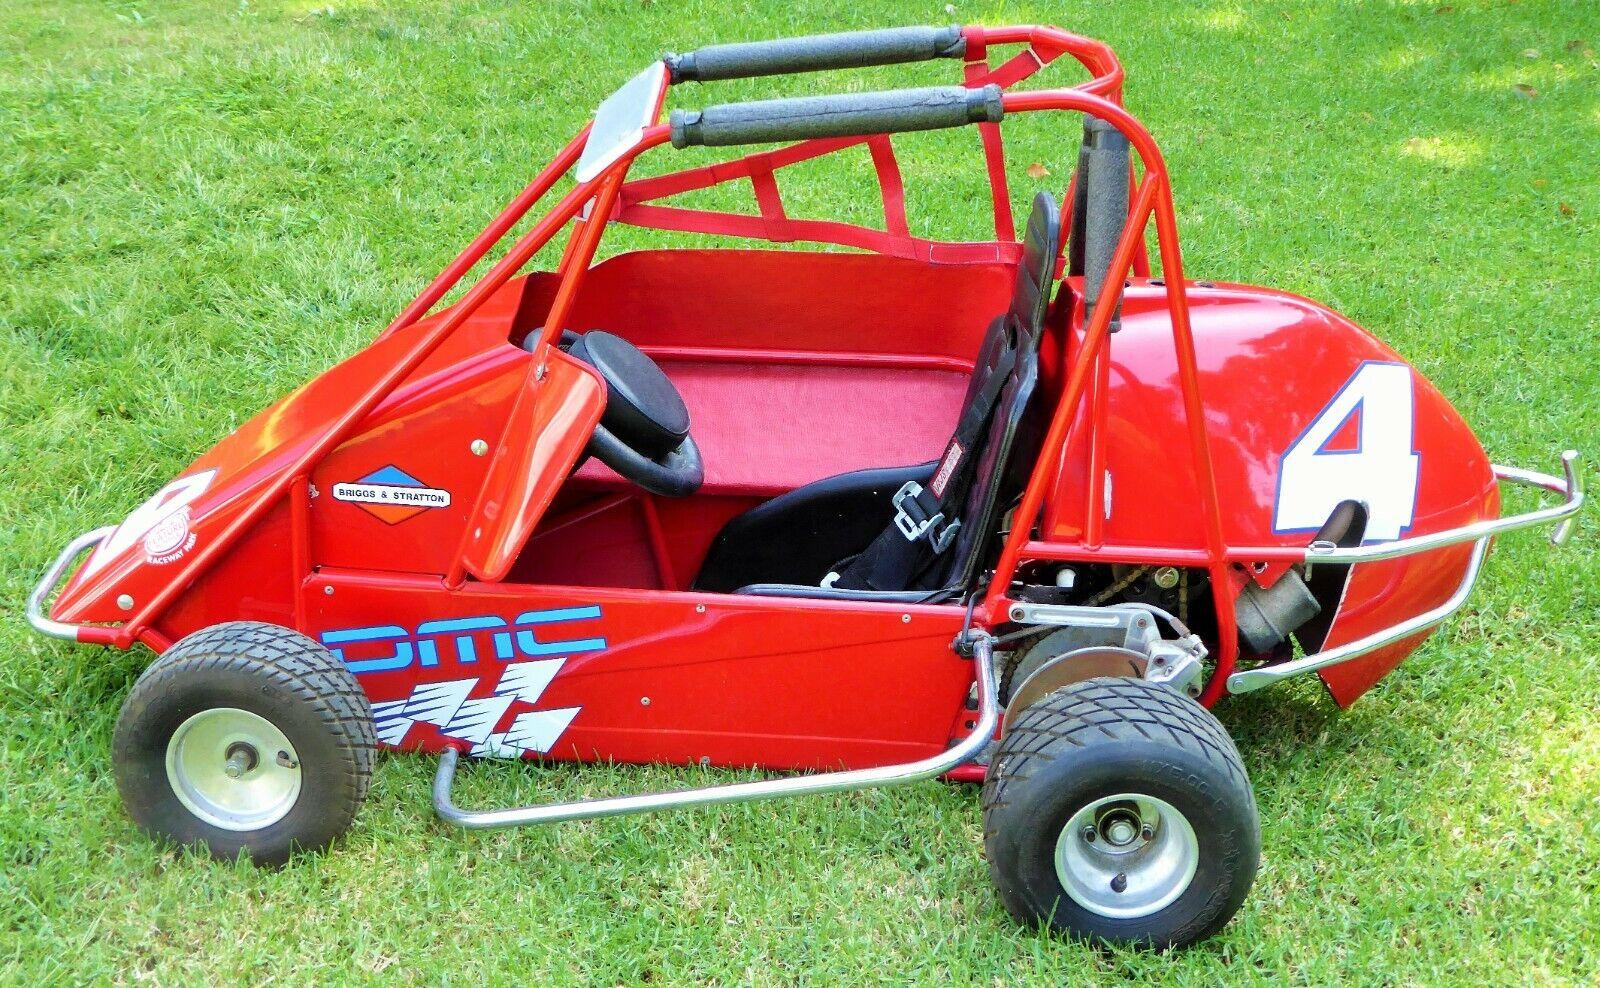 KIDS GO-KART ONE SEAT EXPERT ENGINEER MAKER MTD YARD MACHINES MOTOR #4 DECAL